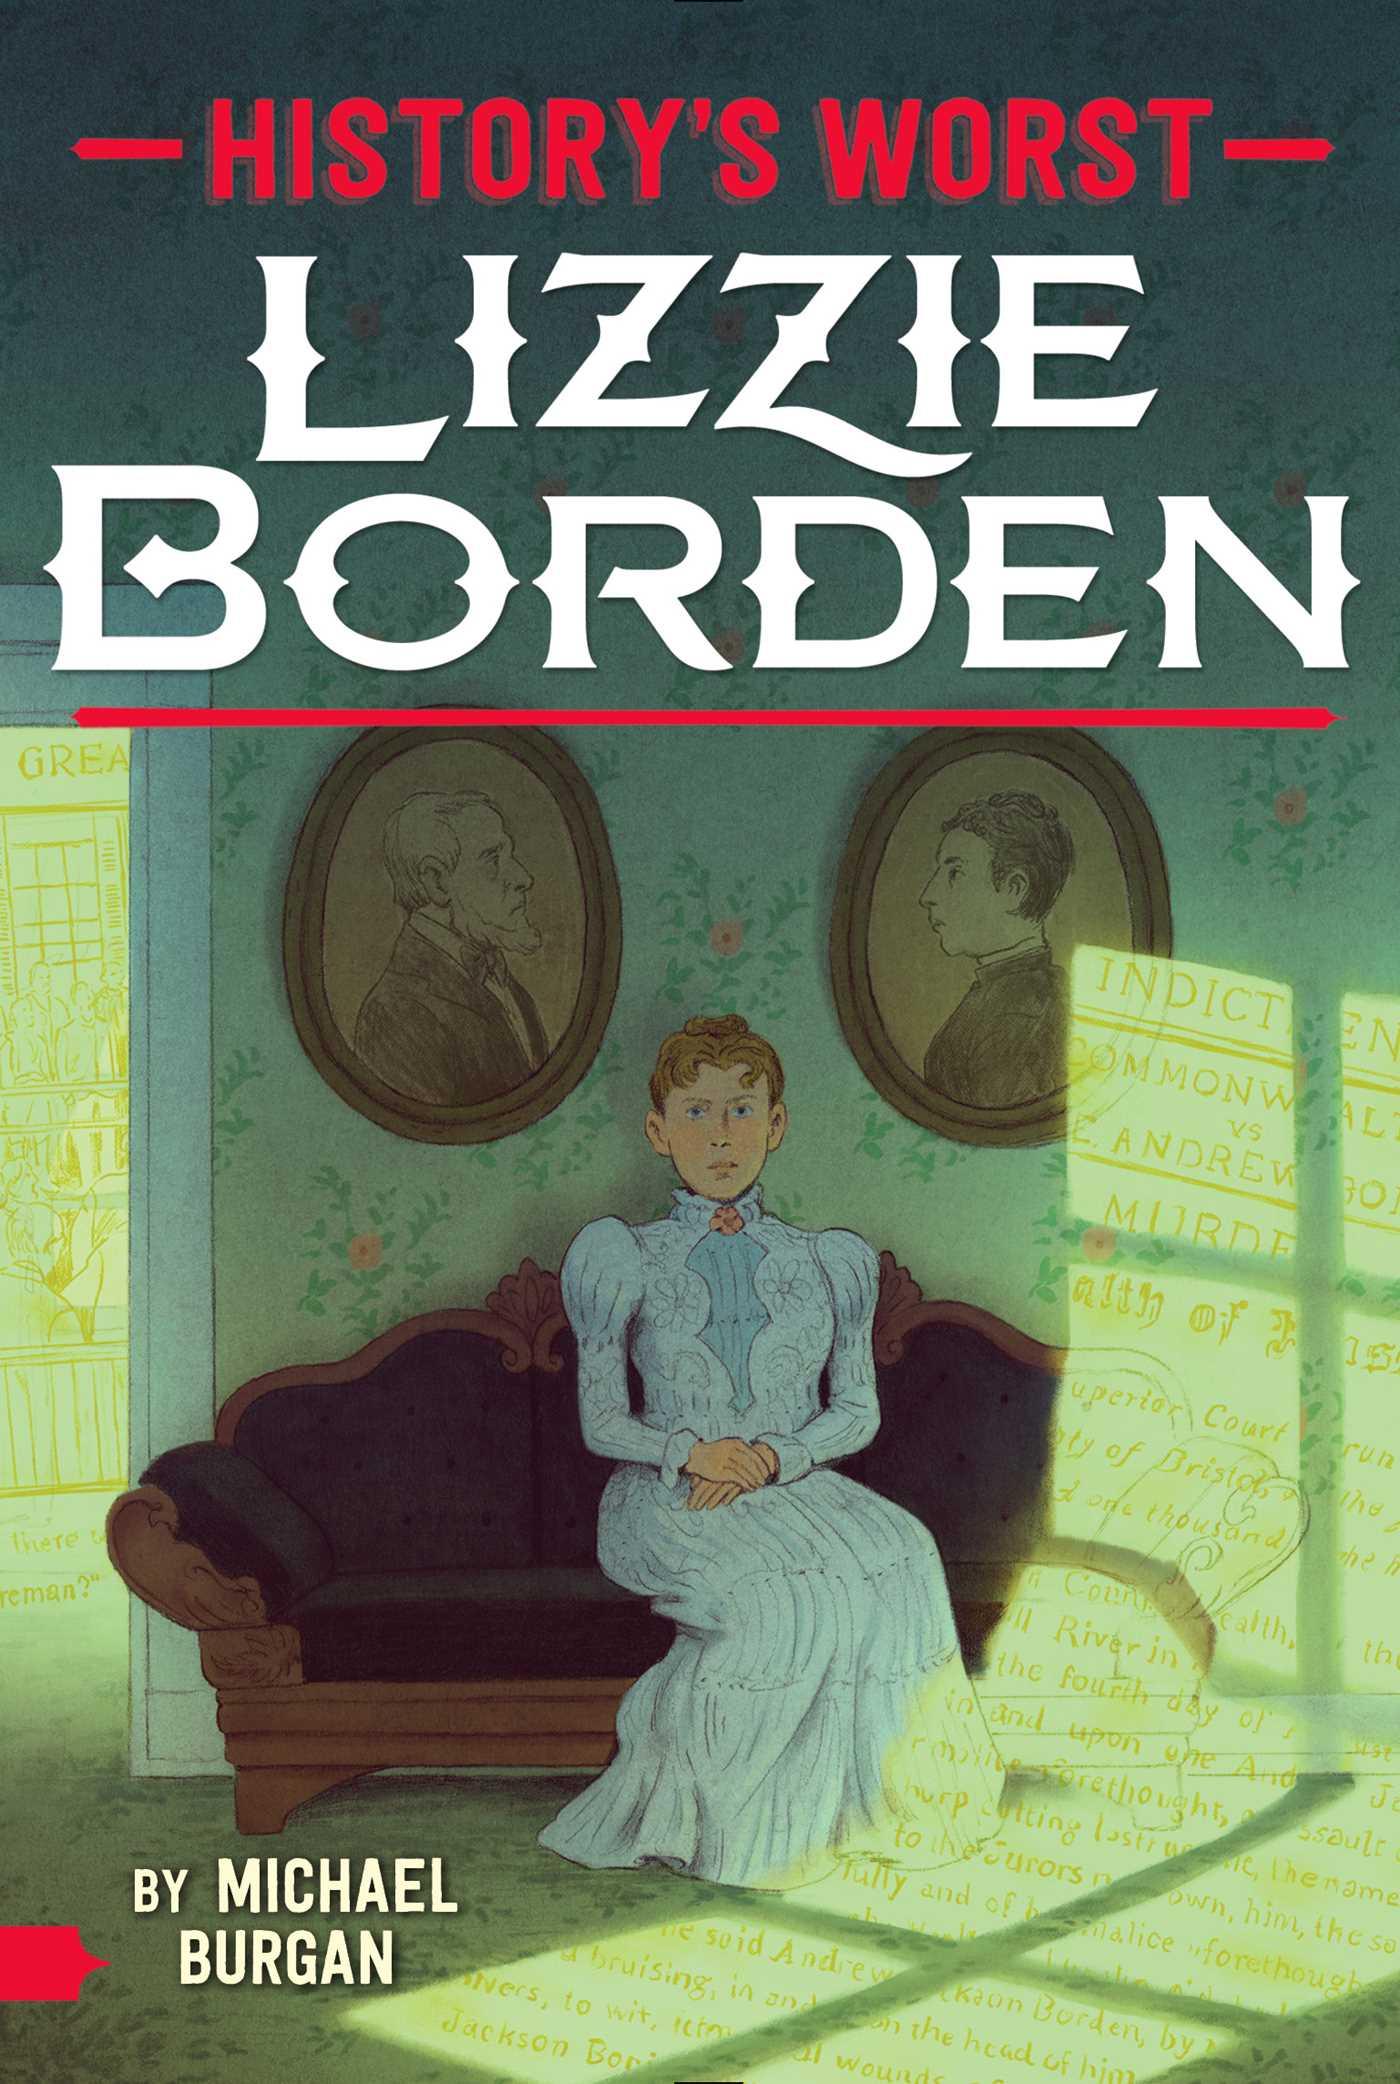 Lizzie Borden eBook by Michael Burgan | Official Publisher